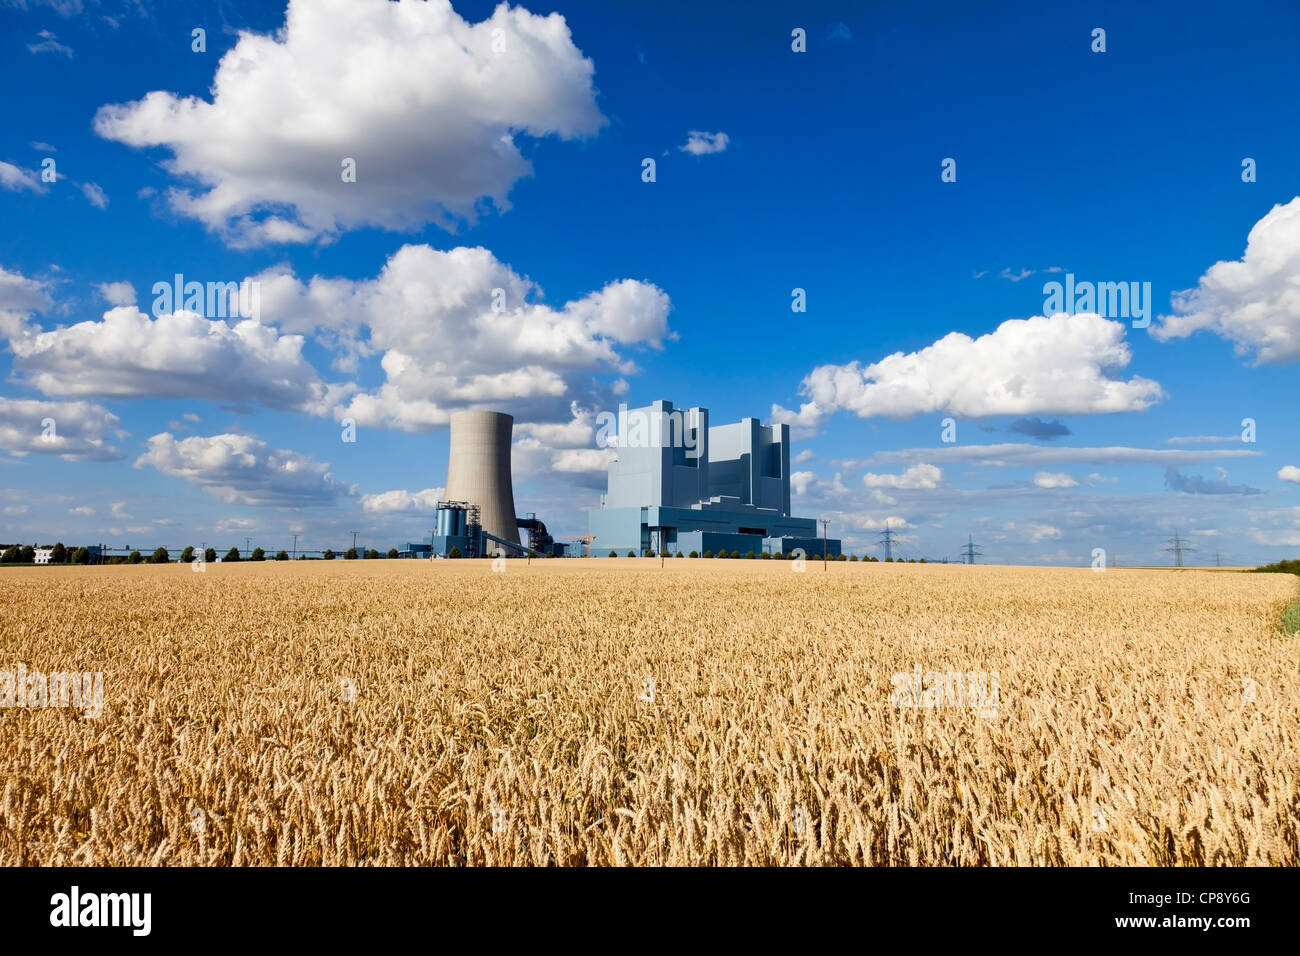 Europe, Germany, North Rhine Westphalia, View of coal power plant with corn field Stock Photo